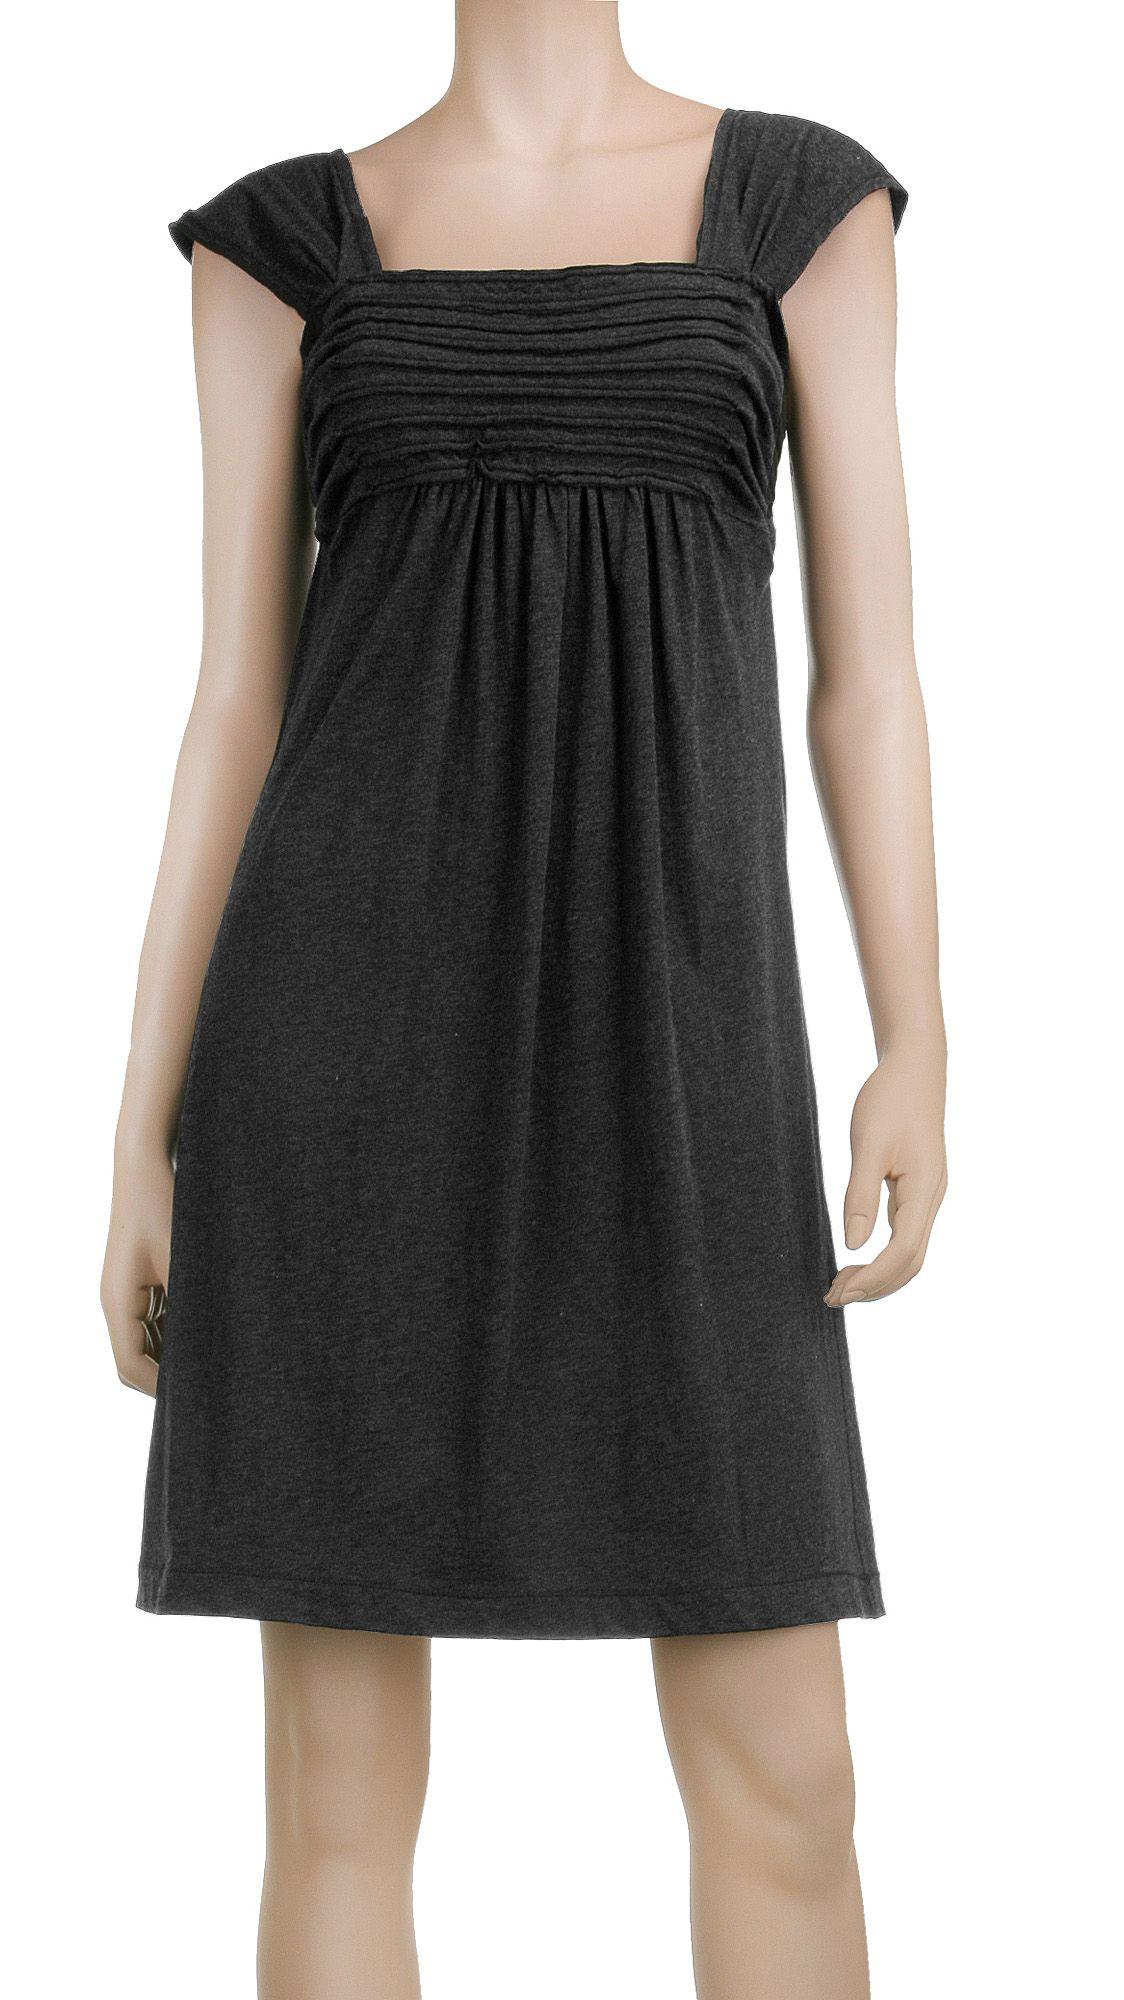 jersey cotton dress | dresses day cotton cashmere jersey dress cotton cashmere jersey dress ...